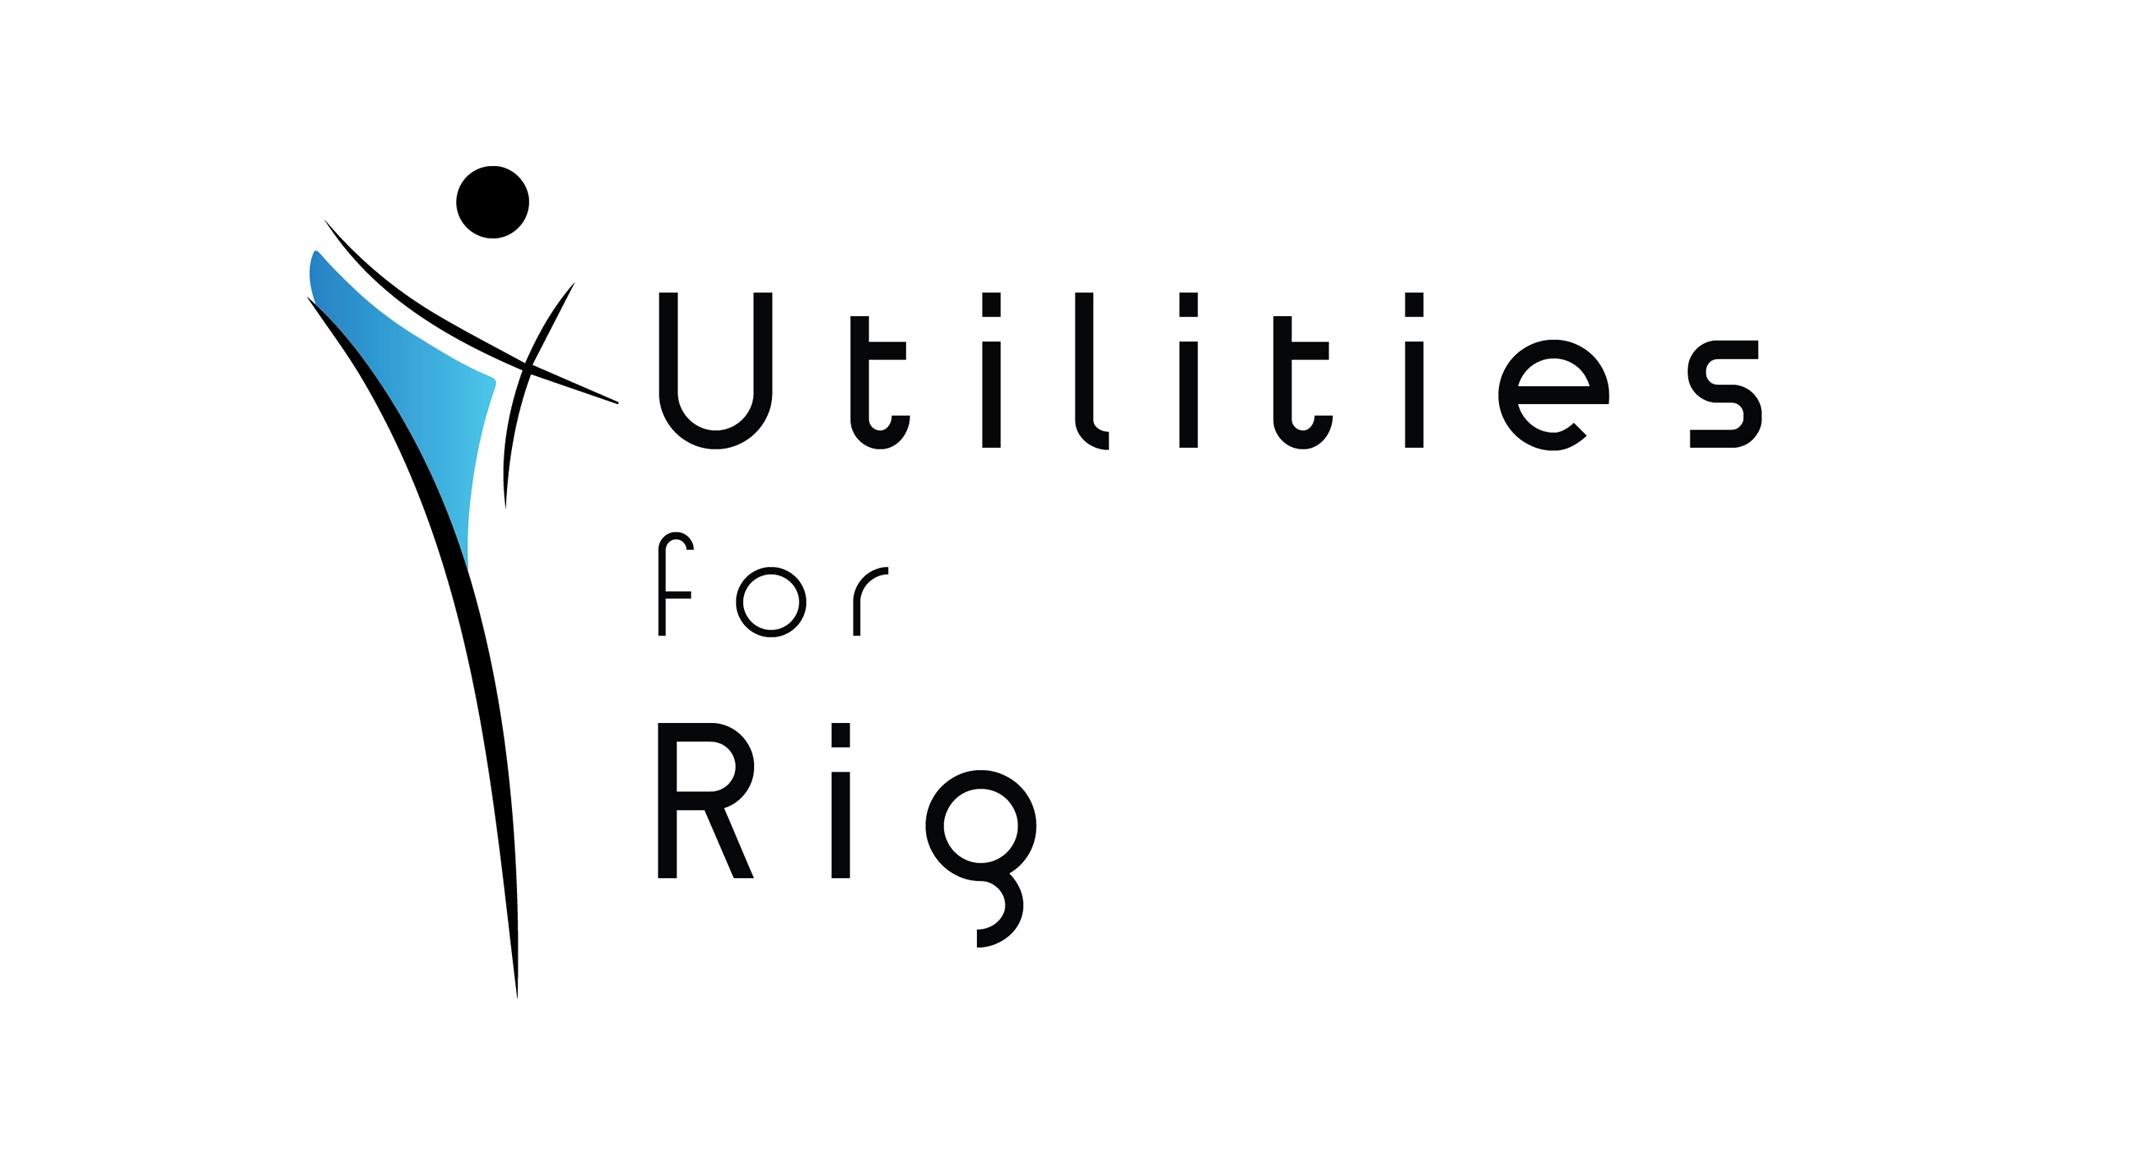 UTILITIES for RIG (create controls, blending IK/FK